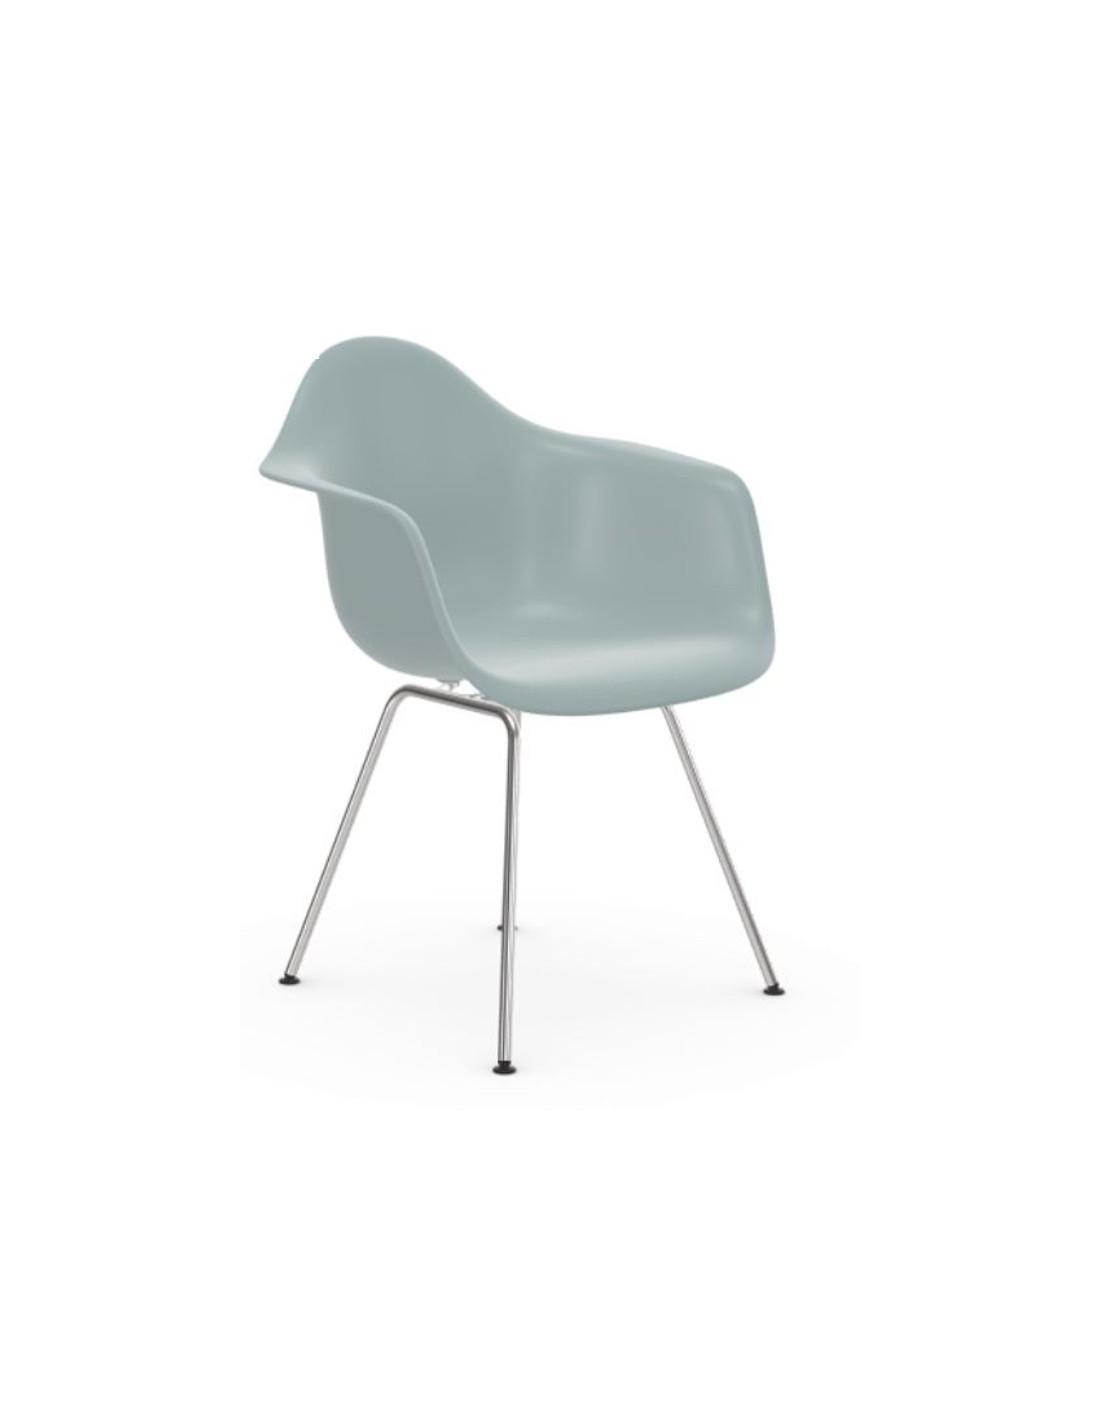 Stuhl Eames Plastic Chair Dax Vitra Ohne Polster Betz